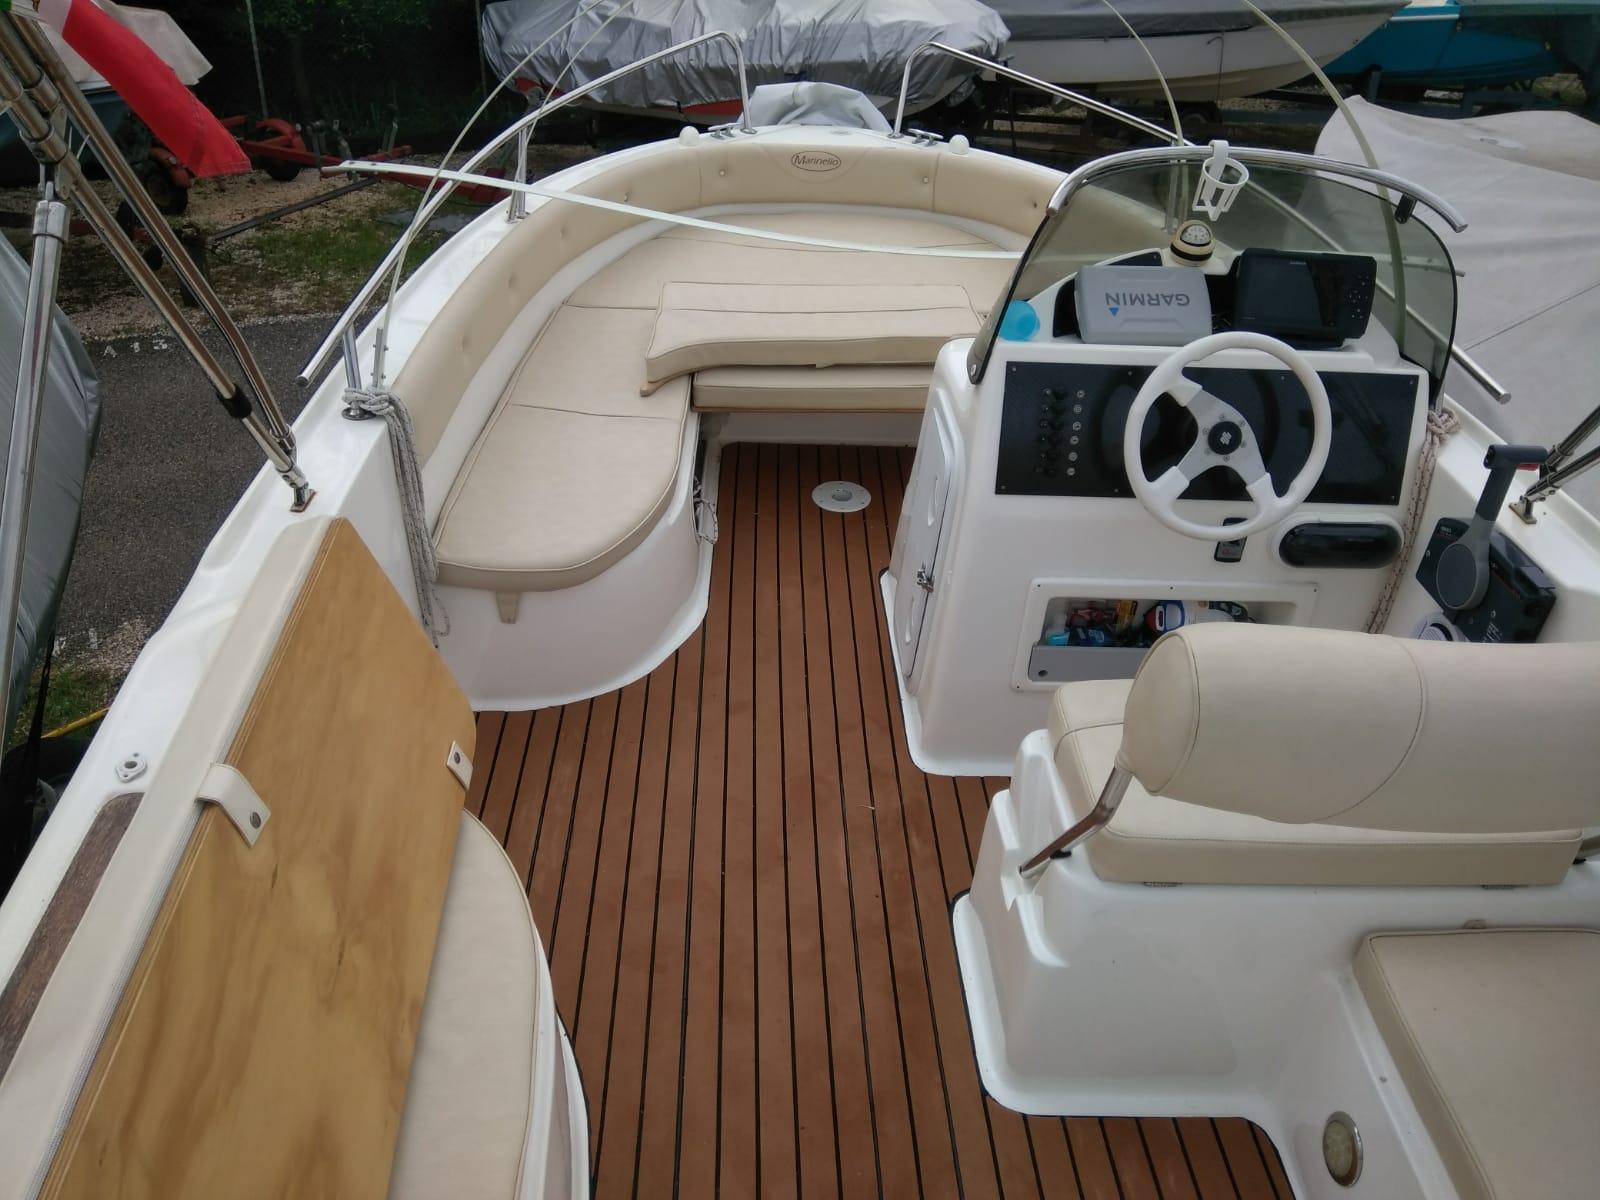 Foto Occasione Open Marinello 18 Eden FULL OPTIONAL + Yamaha F 40/60 - 2